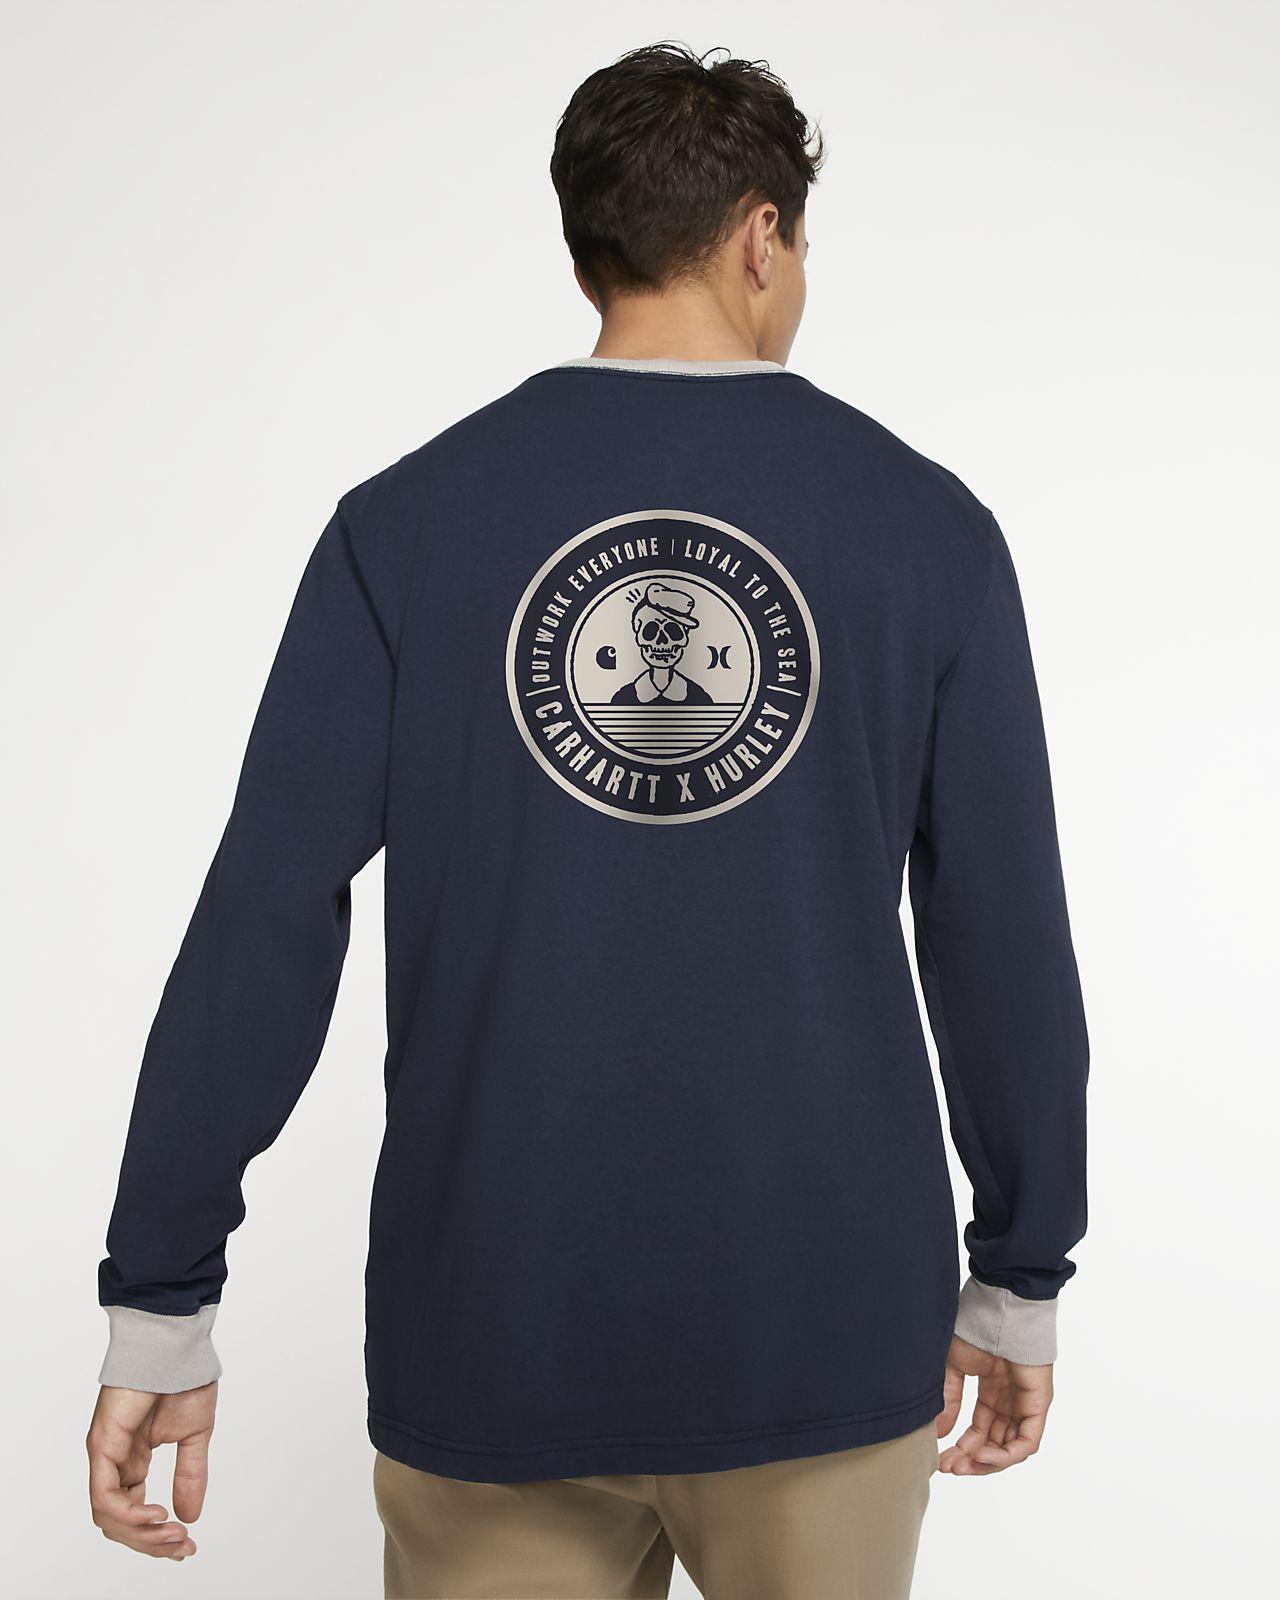 Pánské tričko Hurley x Carhartt Ringer s dlouhým rukávem